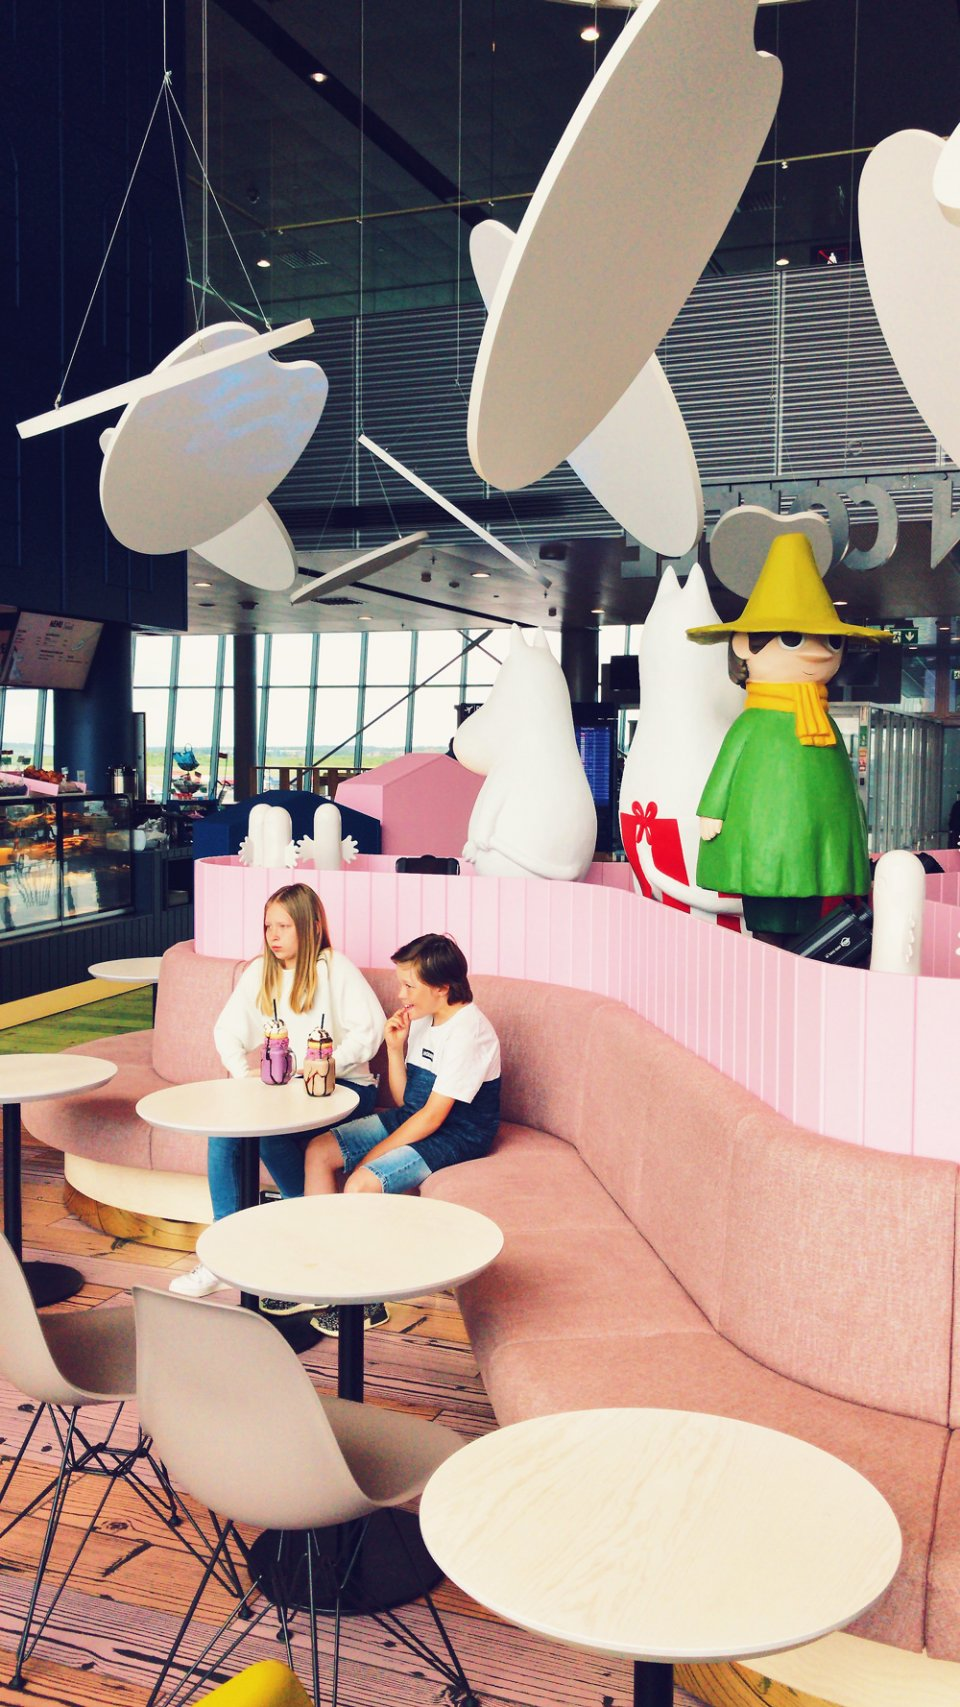 Moomin_Coffee_Helsinki_Airport_Cafe_Portions_Moomins-960x1707